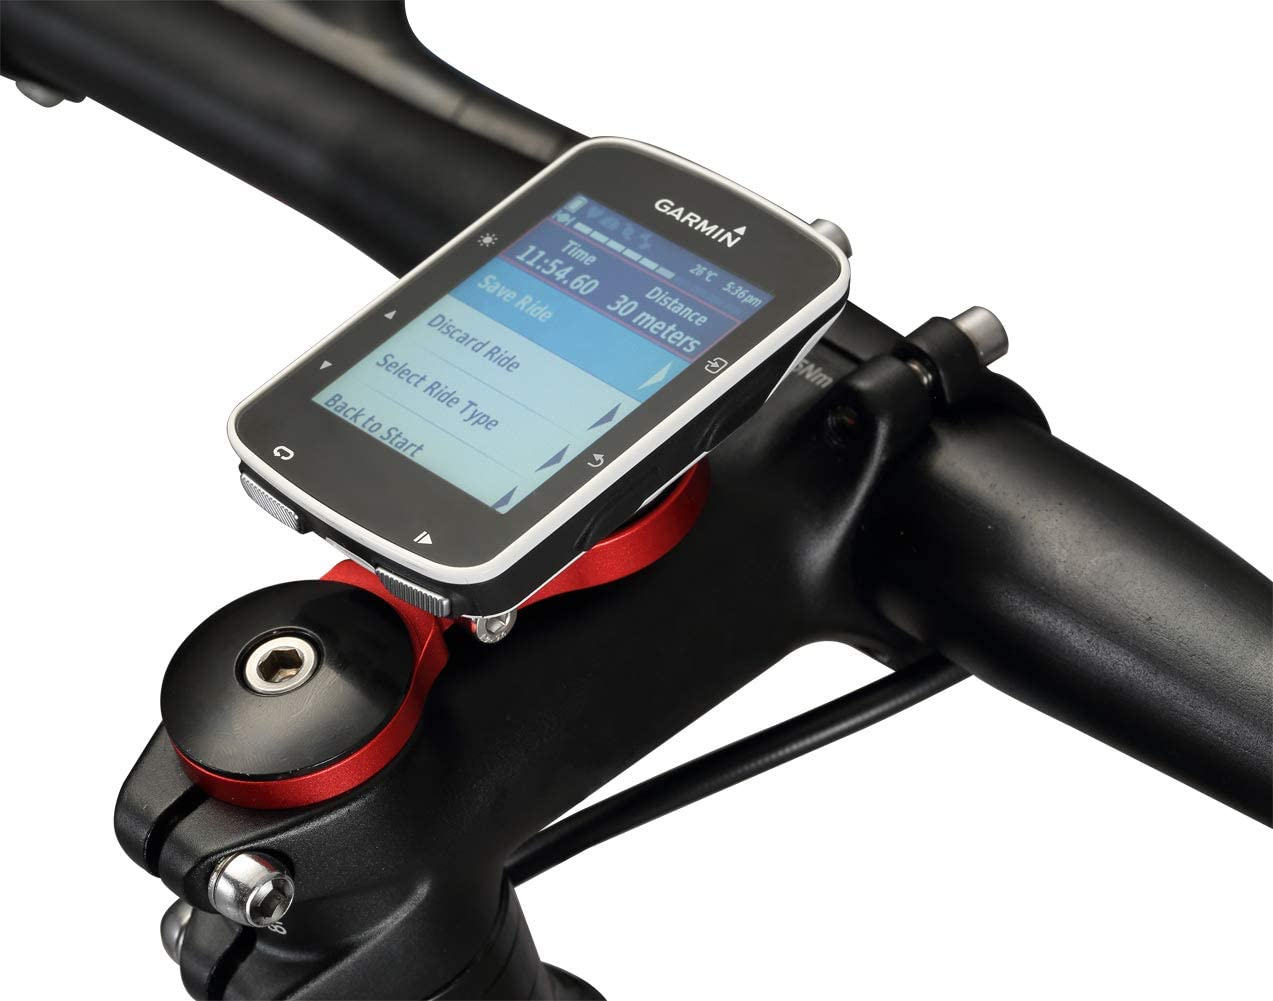 Dymoece Adjustable Bicycle Stem Computer Mount for Garmin Edge 25 130 200 500 510 520 800 810 820 1000 1030